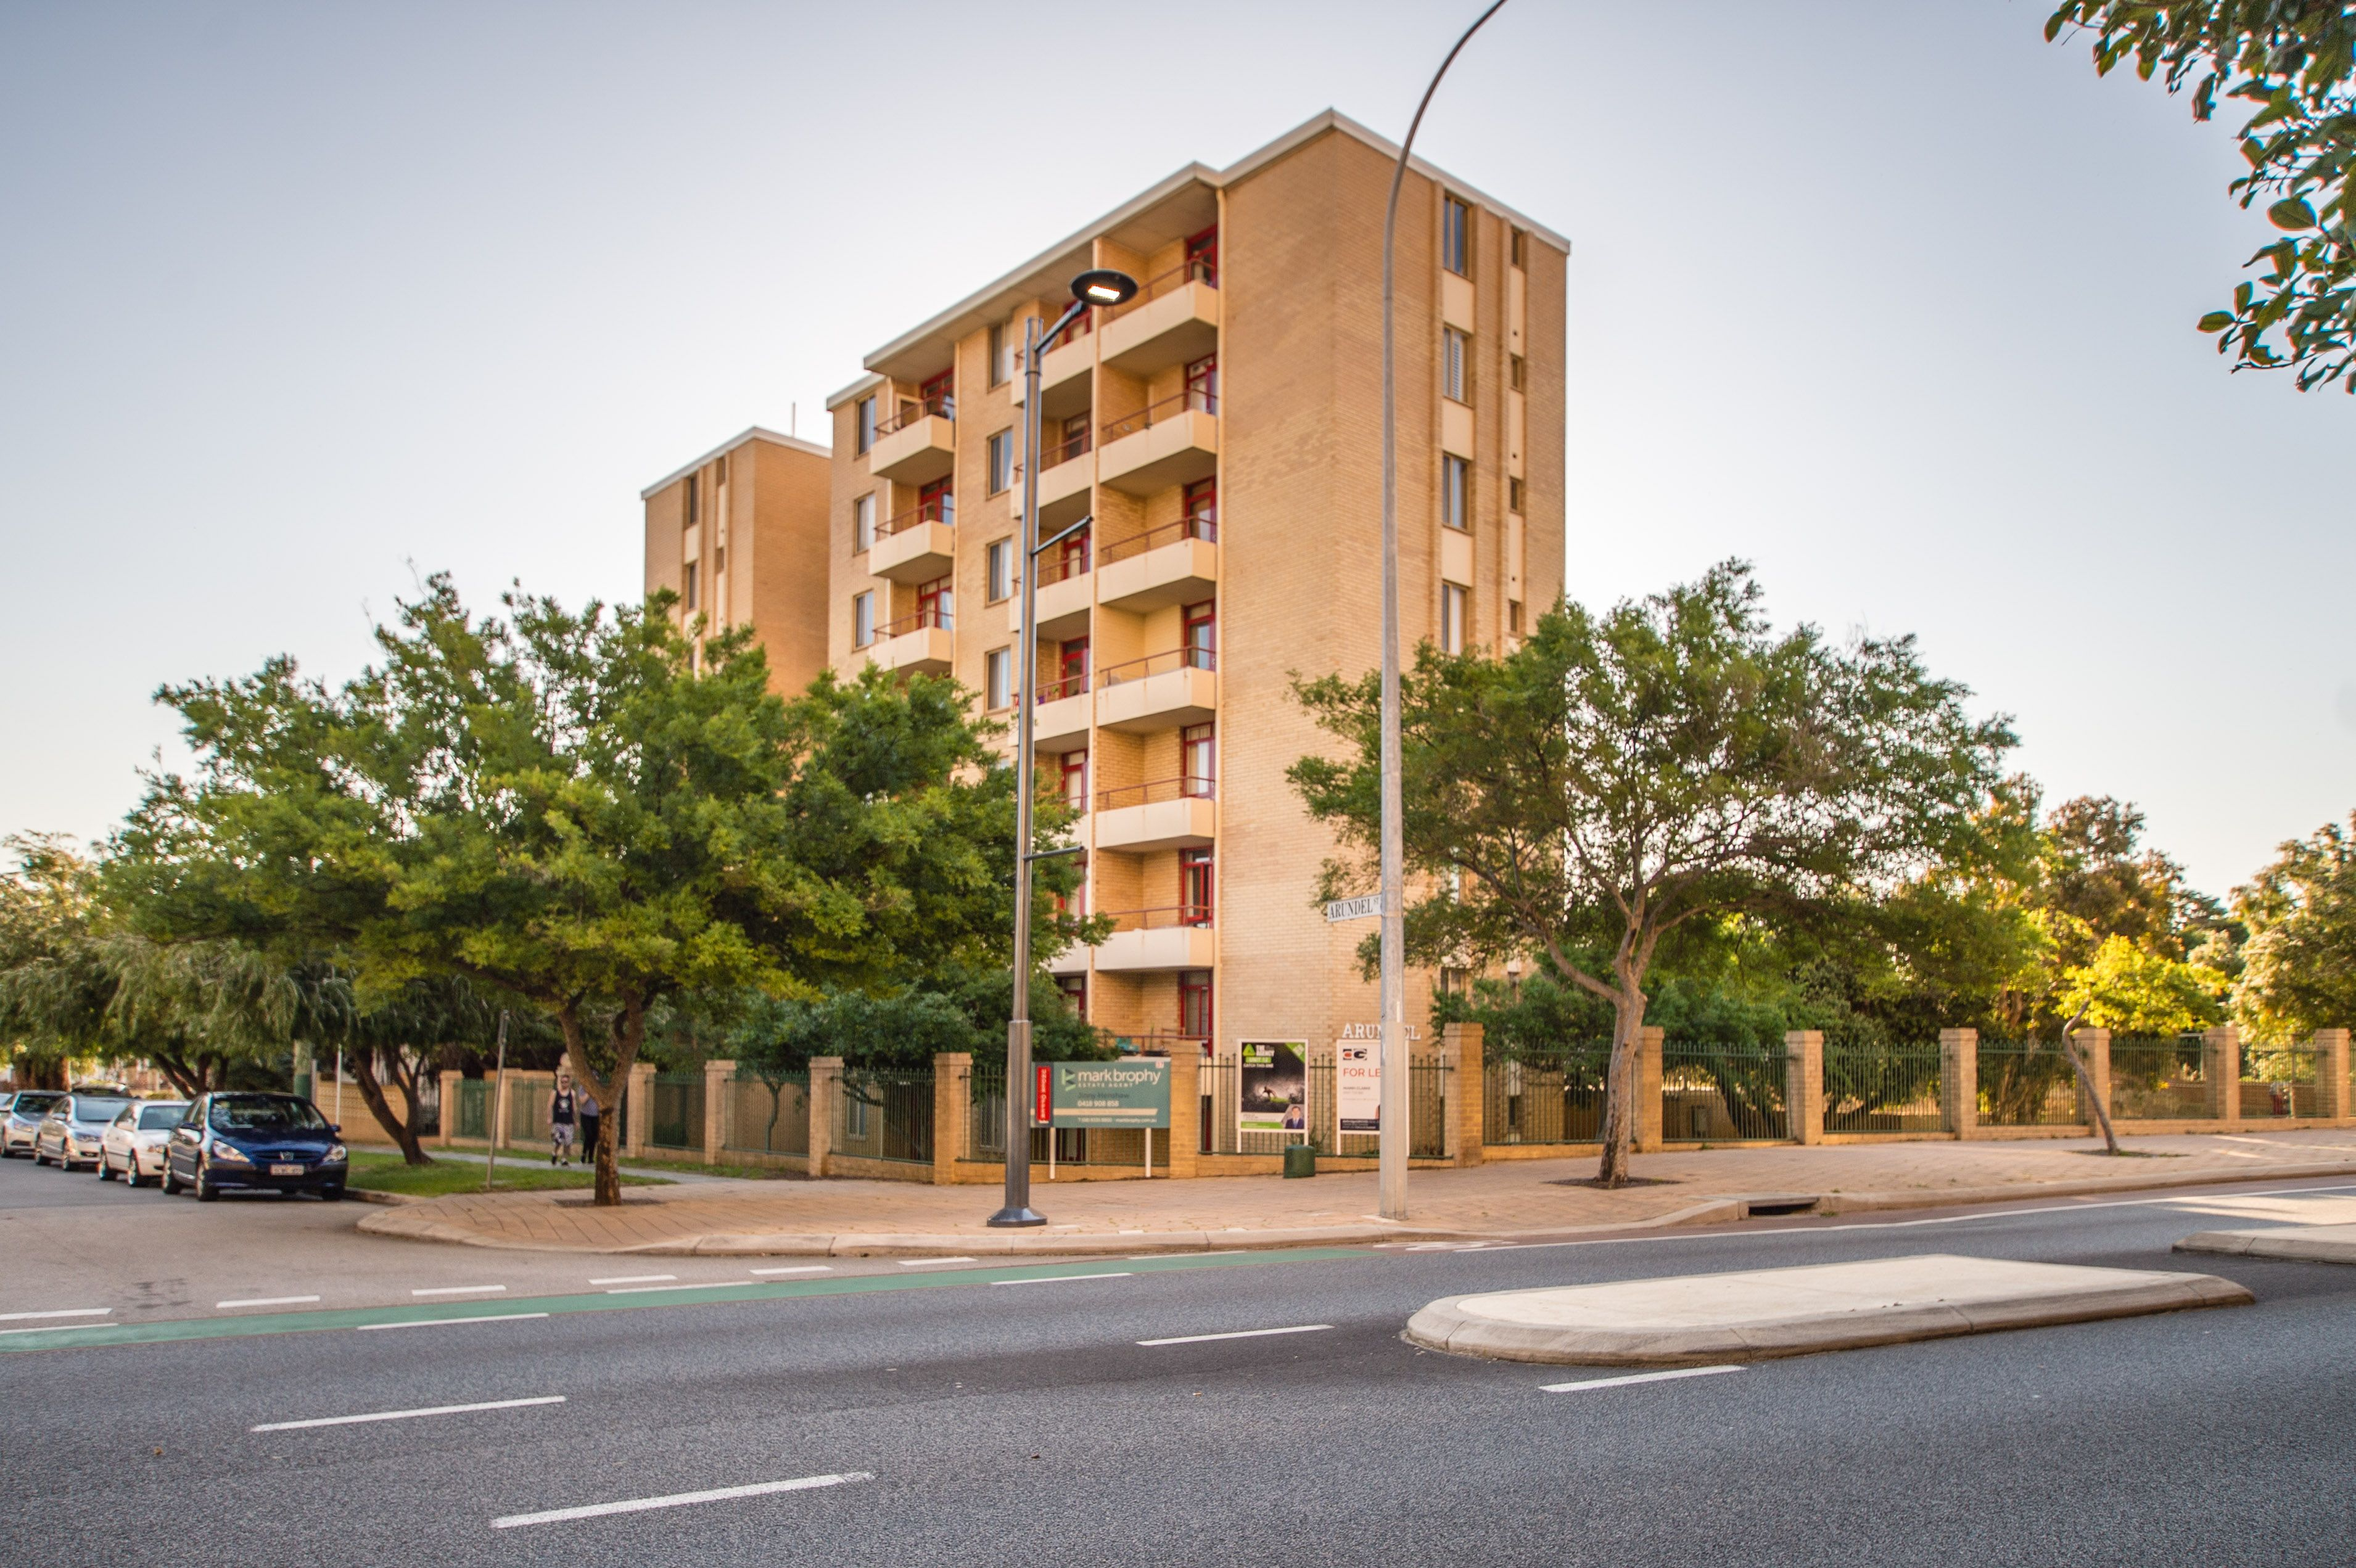 7/34 Arundel Street, Fremantle